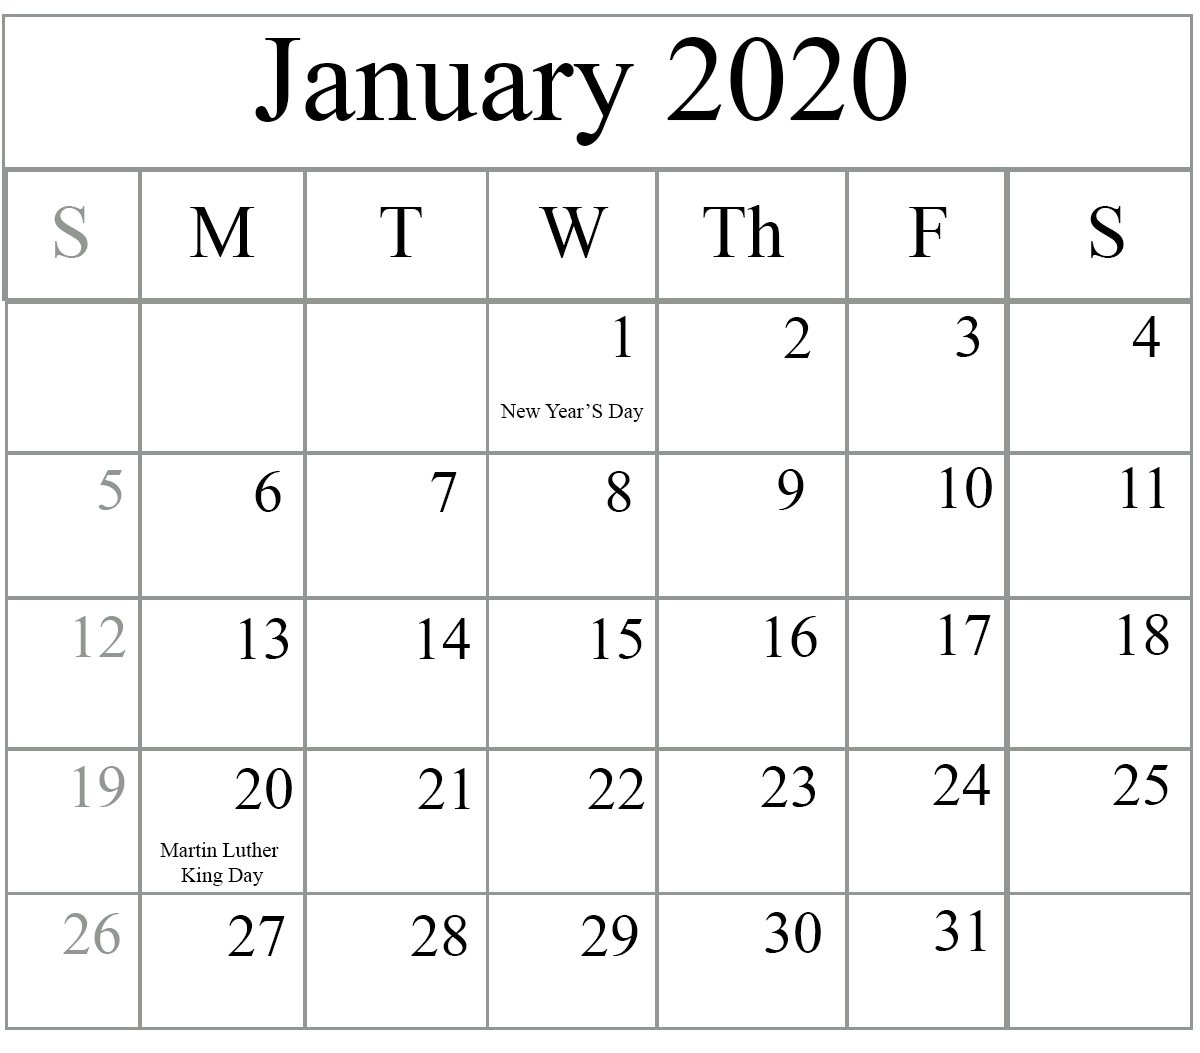 Free January 2020 Printable Calendar In Pdf, Excel & Word-January 2020 Calendar Dates